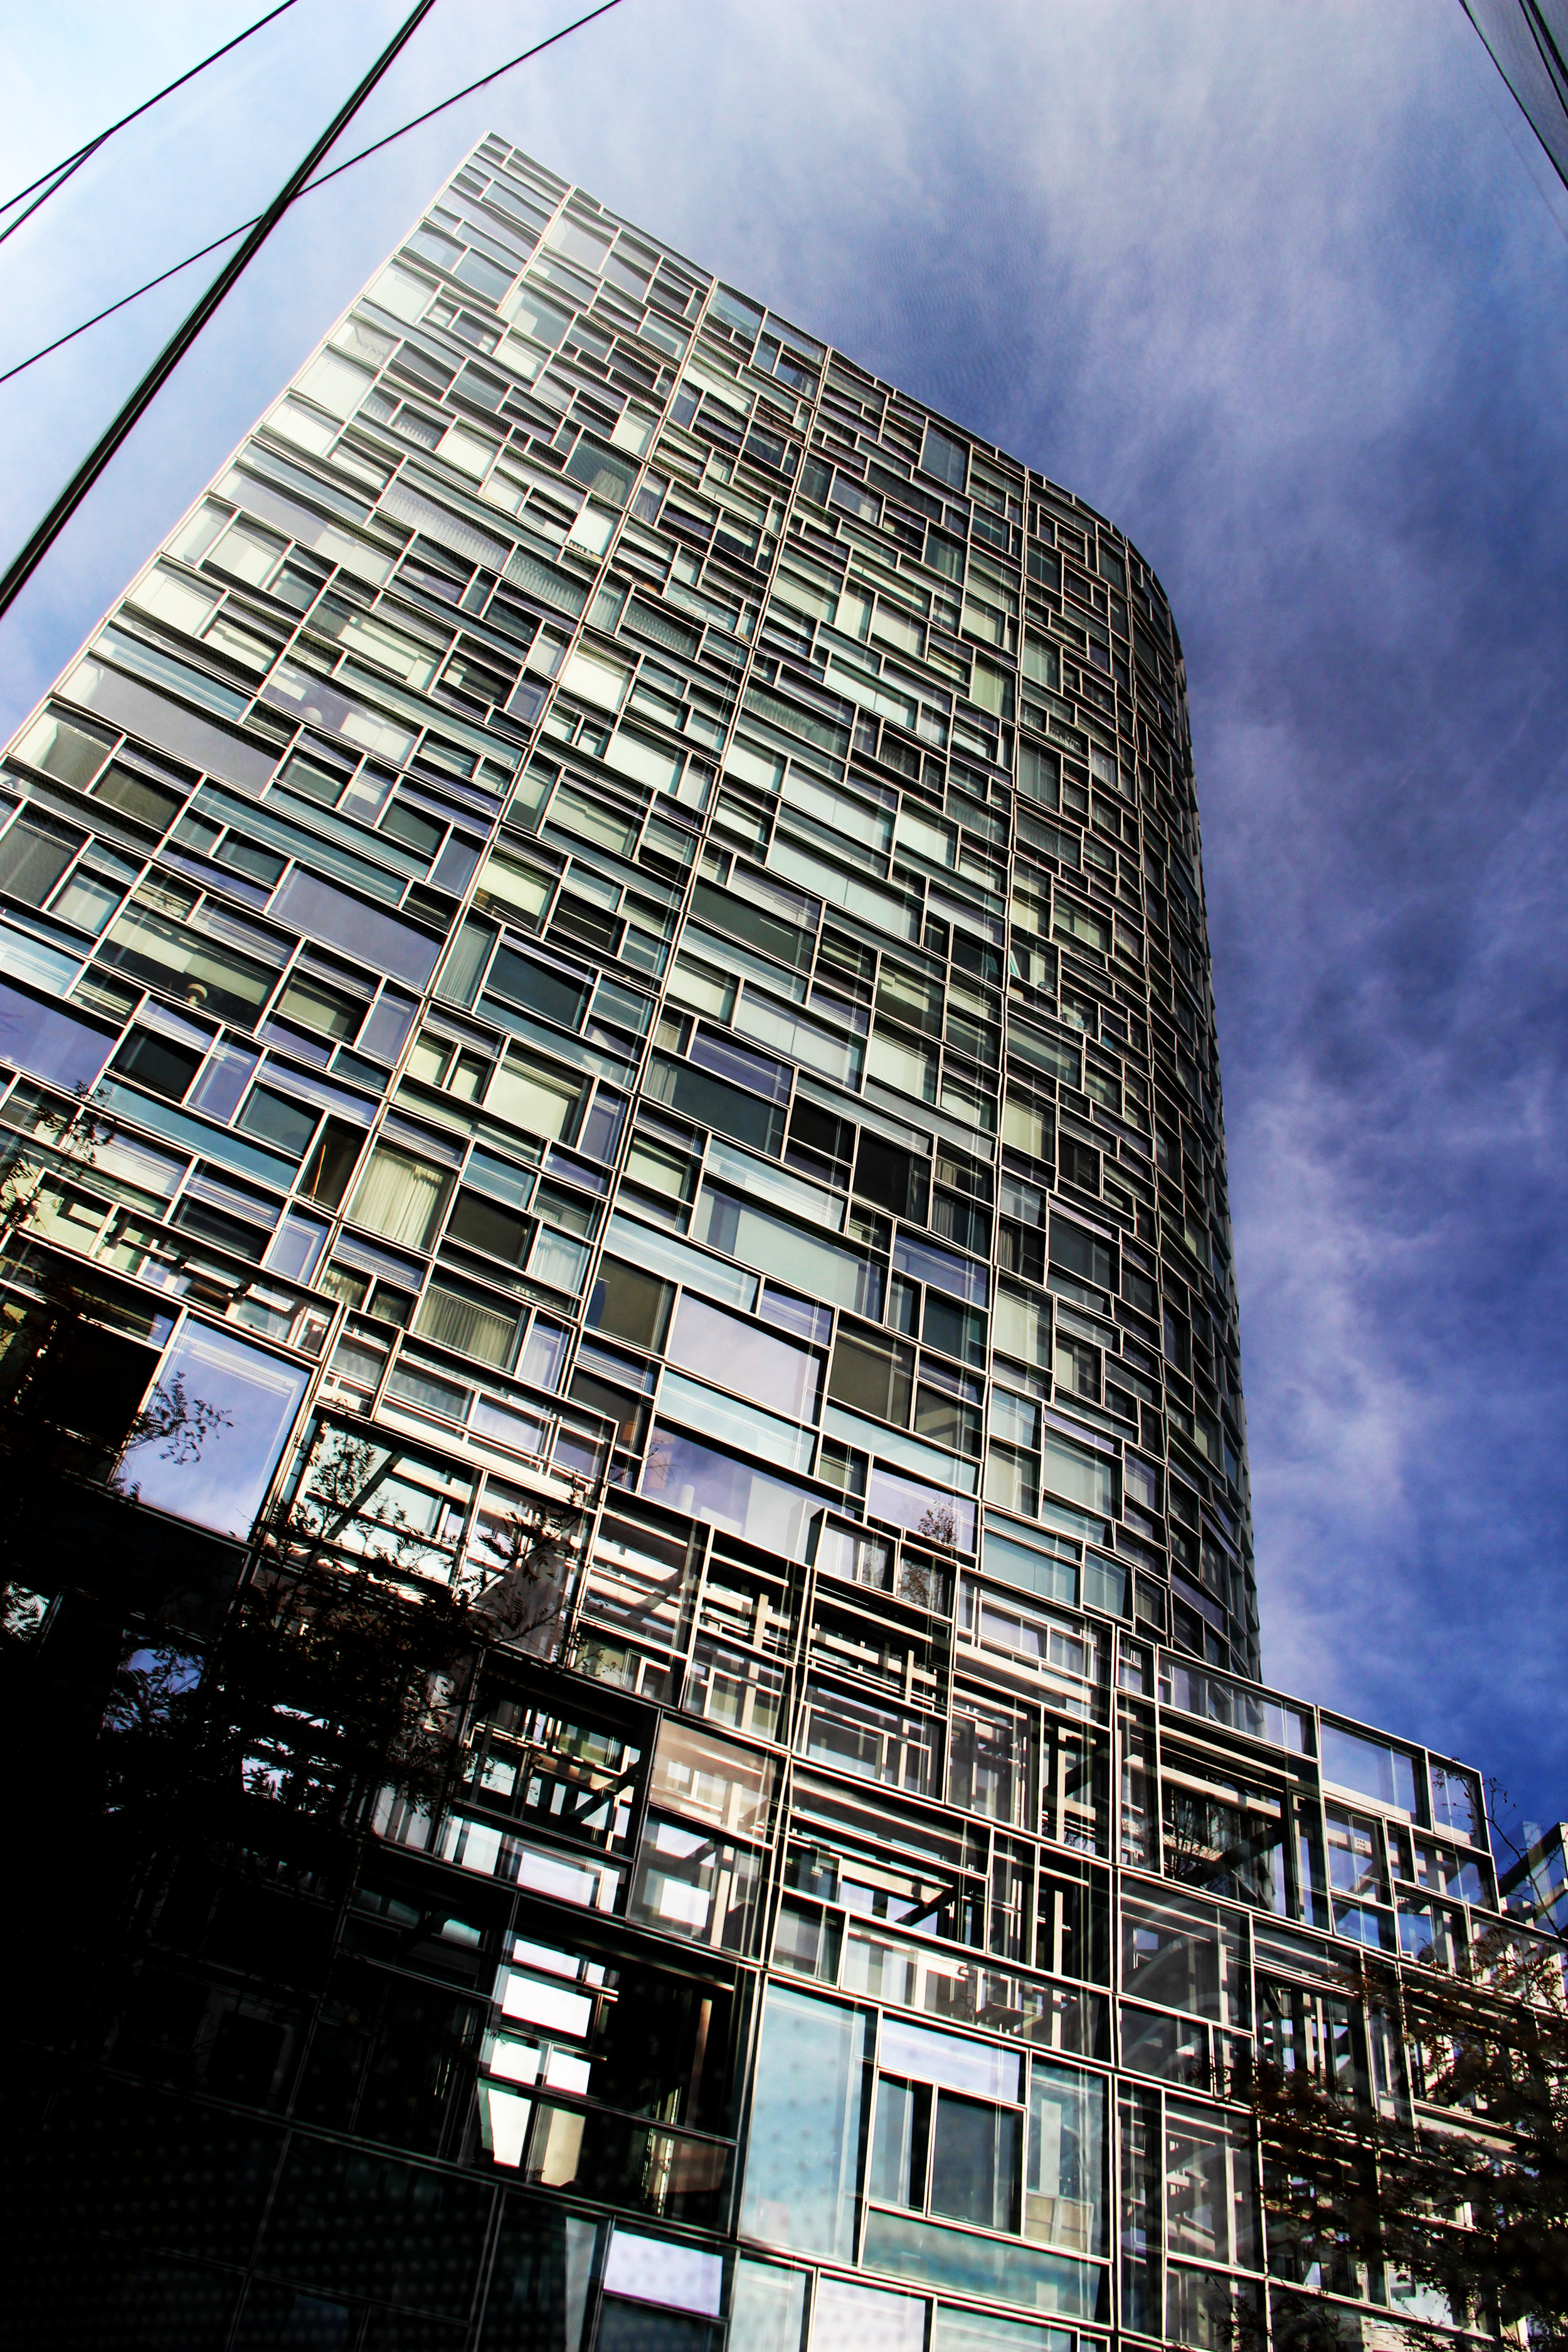 Frank Ghery & Jean Nouvel Buildings, Chelsea, Manhattan, November 9, 2014